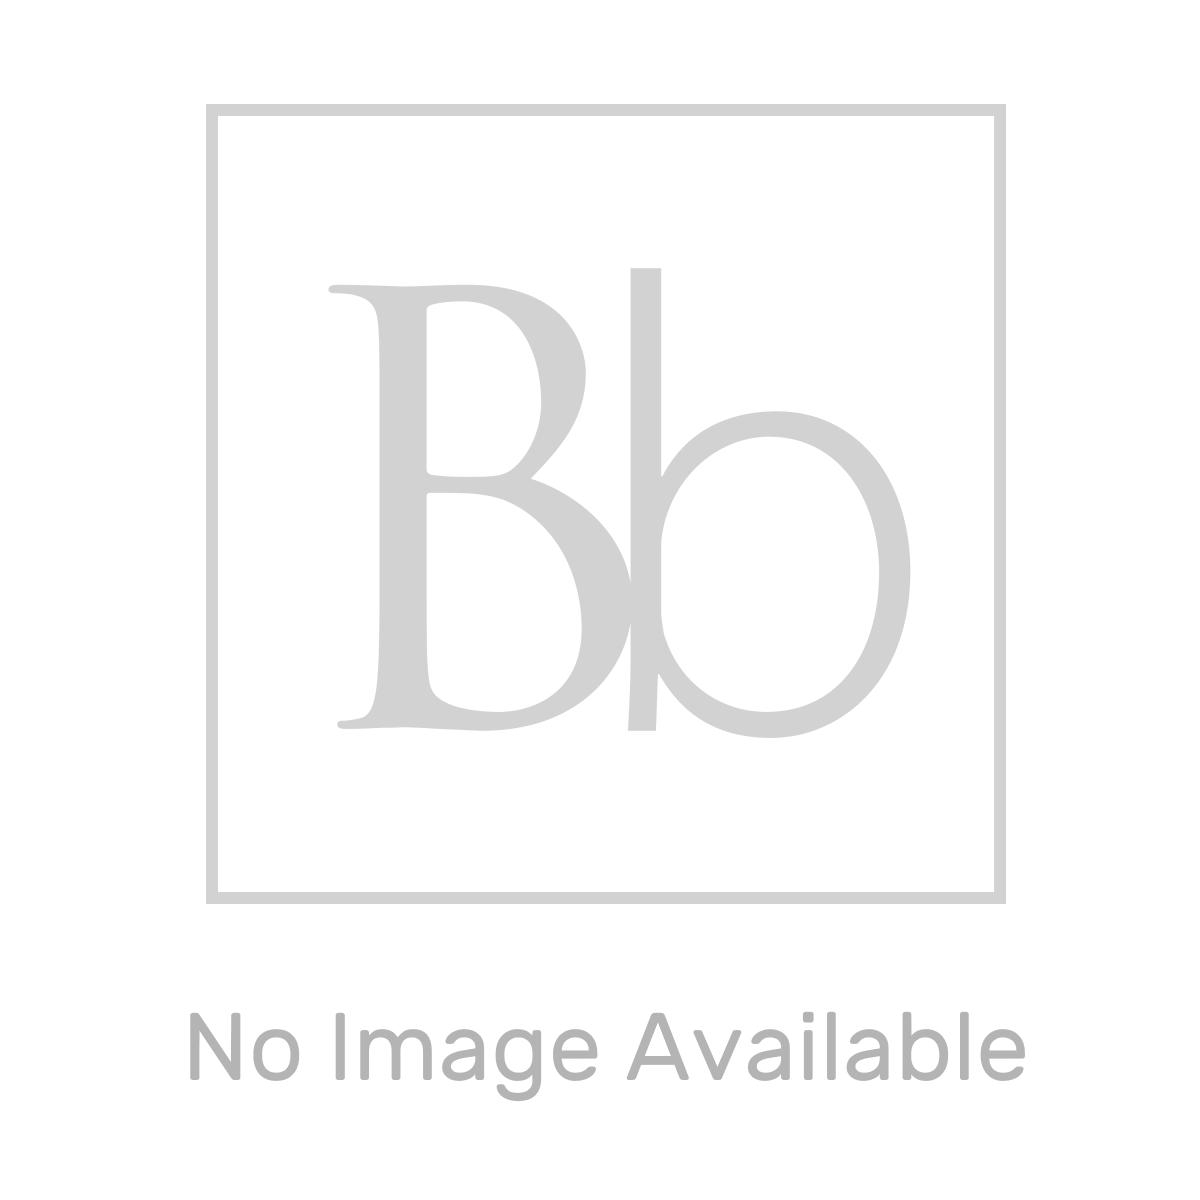 Nuie Athena Hacienda Black 2 Drawer Floor Standing Vanity Unit with 18mm Worktop 800mm